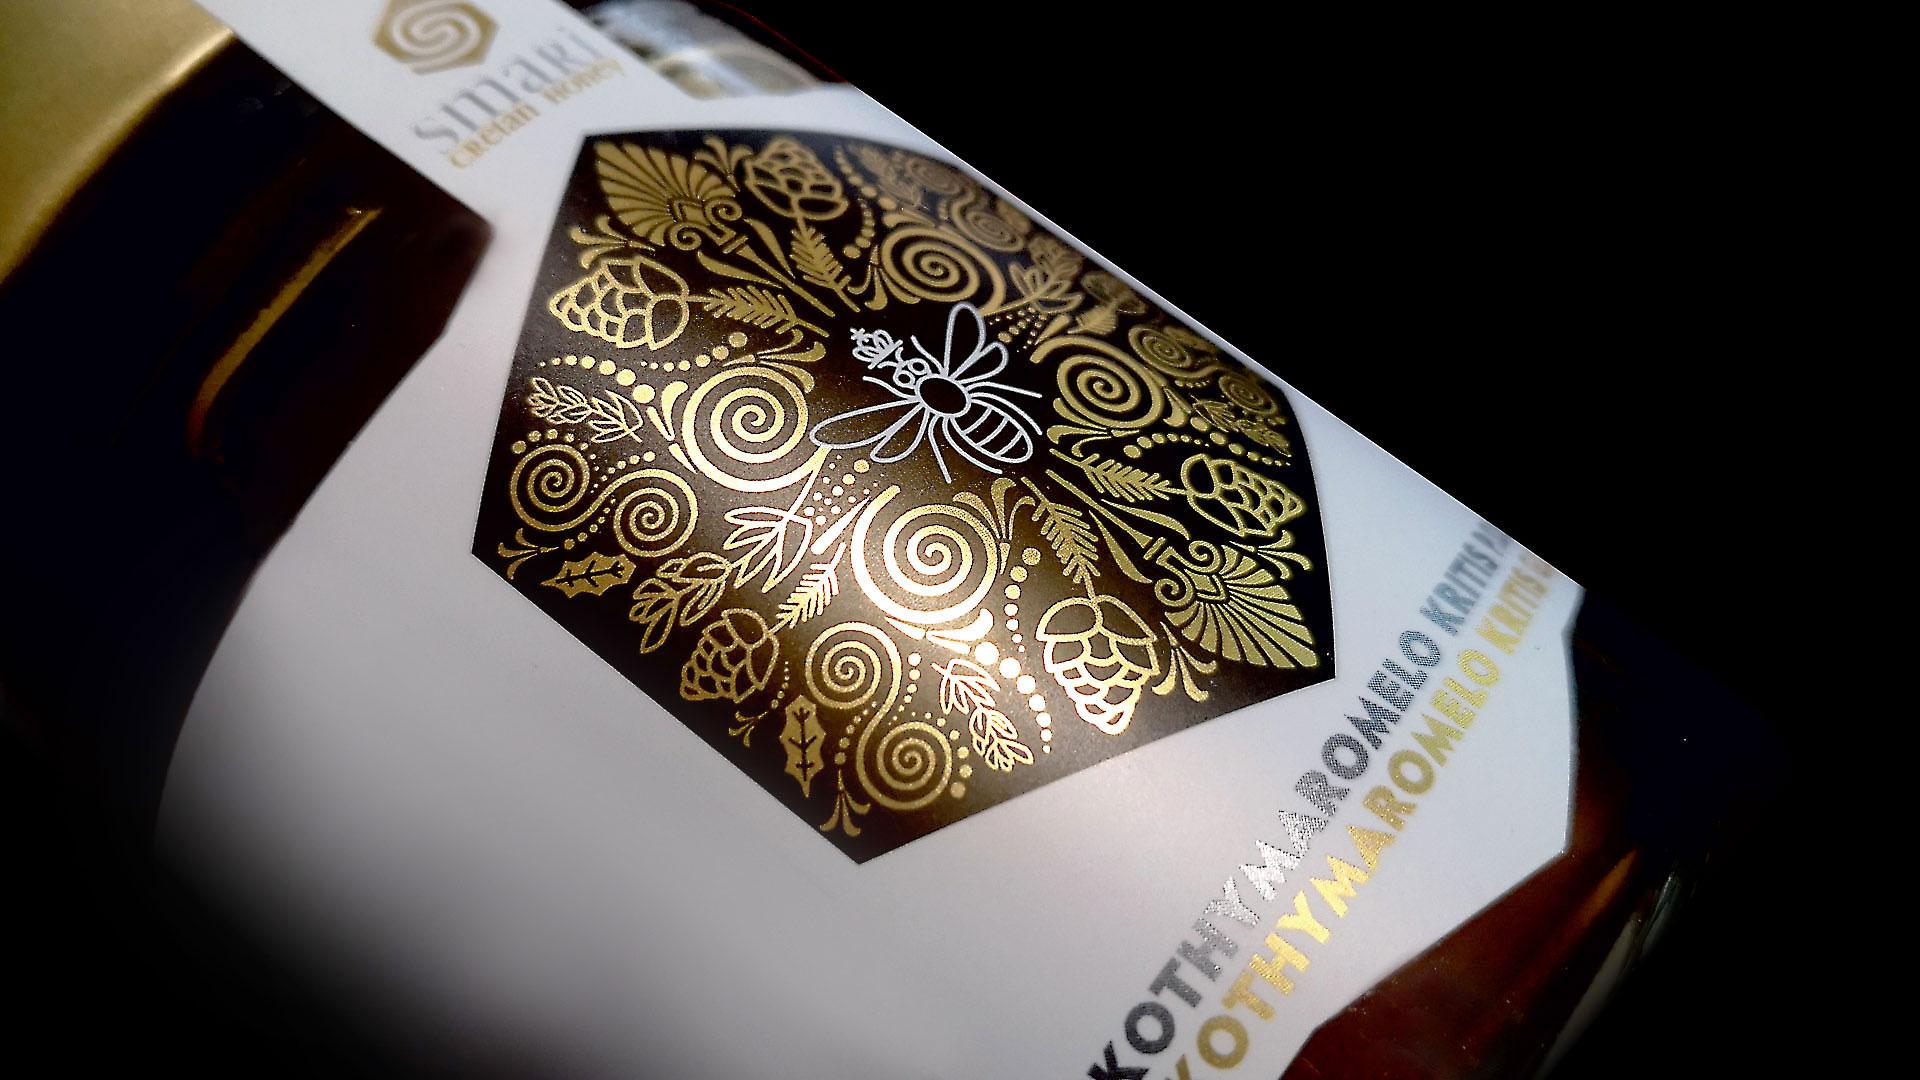 Smari Cretan Honey Company Packaging Design by Leftgpaphic